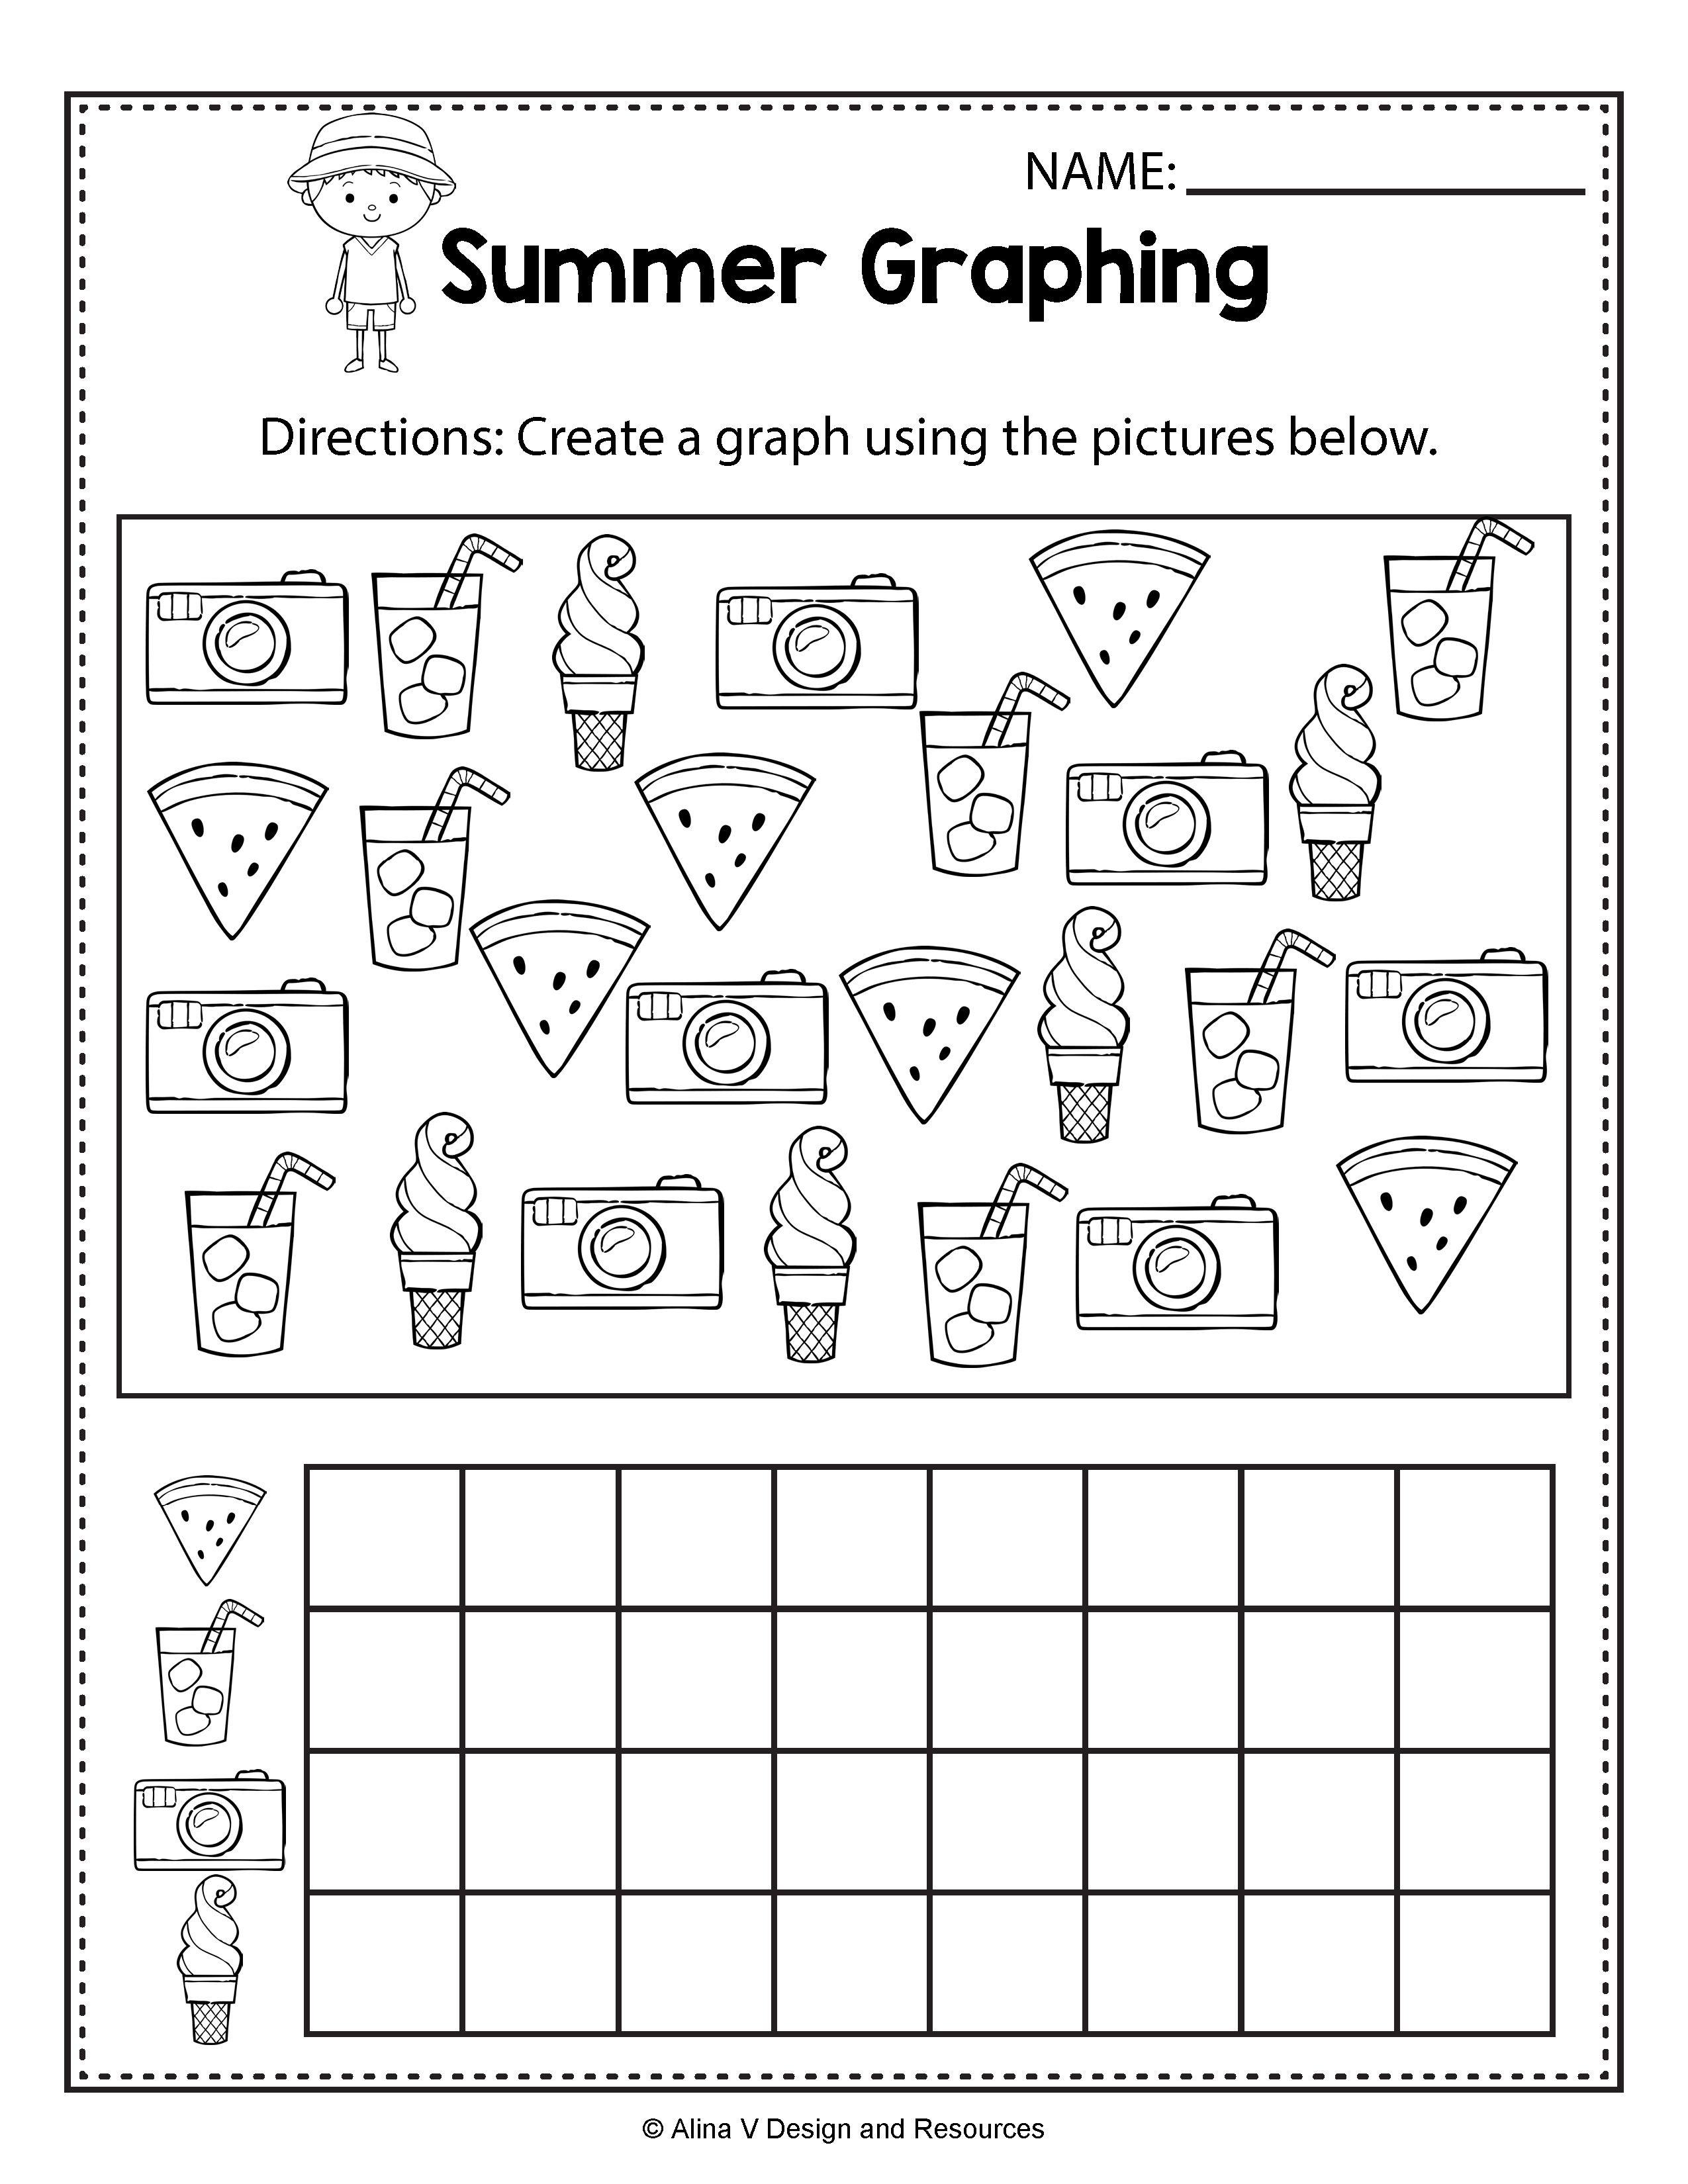 Summer Graphing Summer Math Worksheets And Activities For Preschool Kindergarten And Summer Math Worksheets Graphing Worksheets Kindergarten Math Worksheets